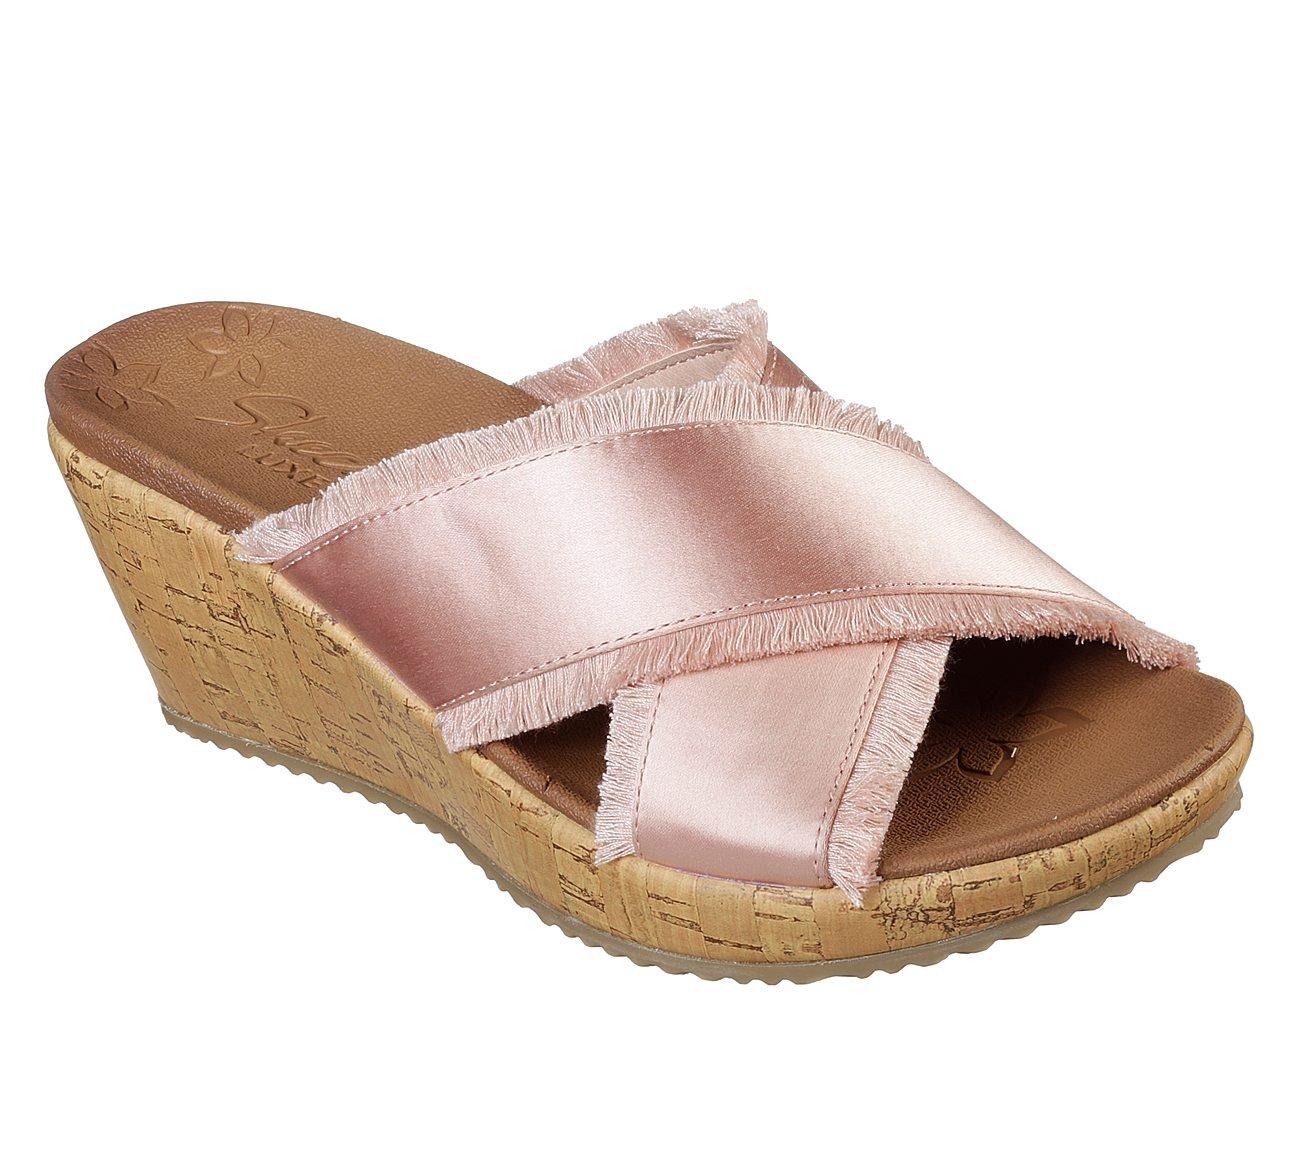 Skechers Women's Beverlee Street Style Wedge Sandal, Light Pink,10 US